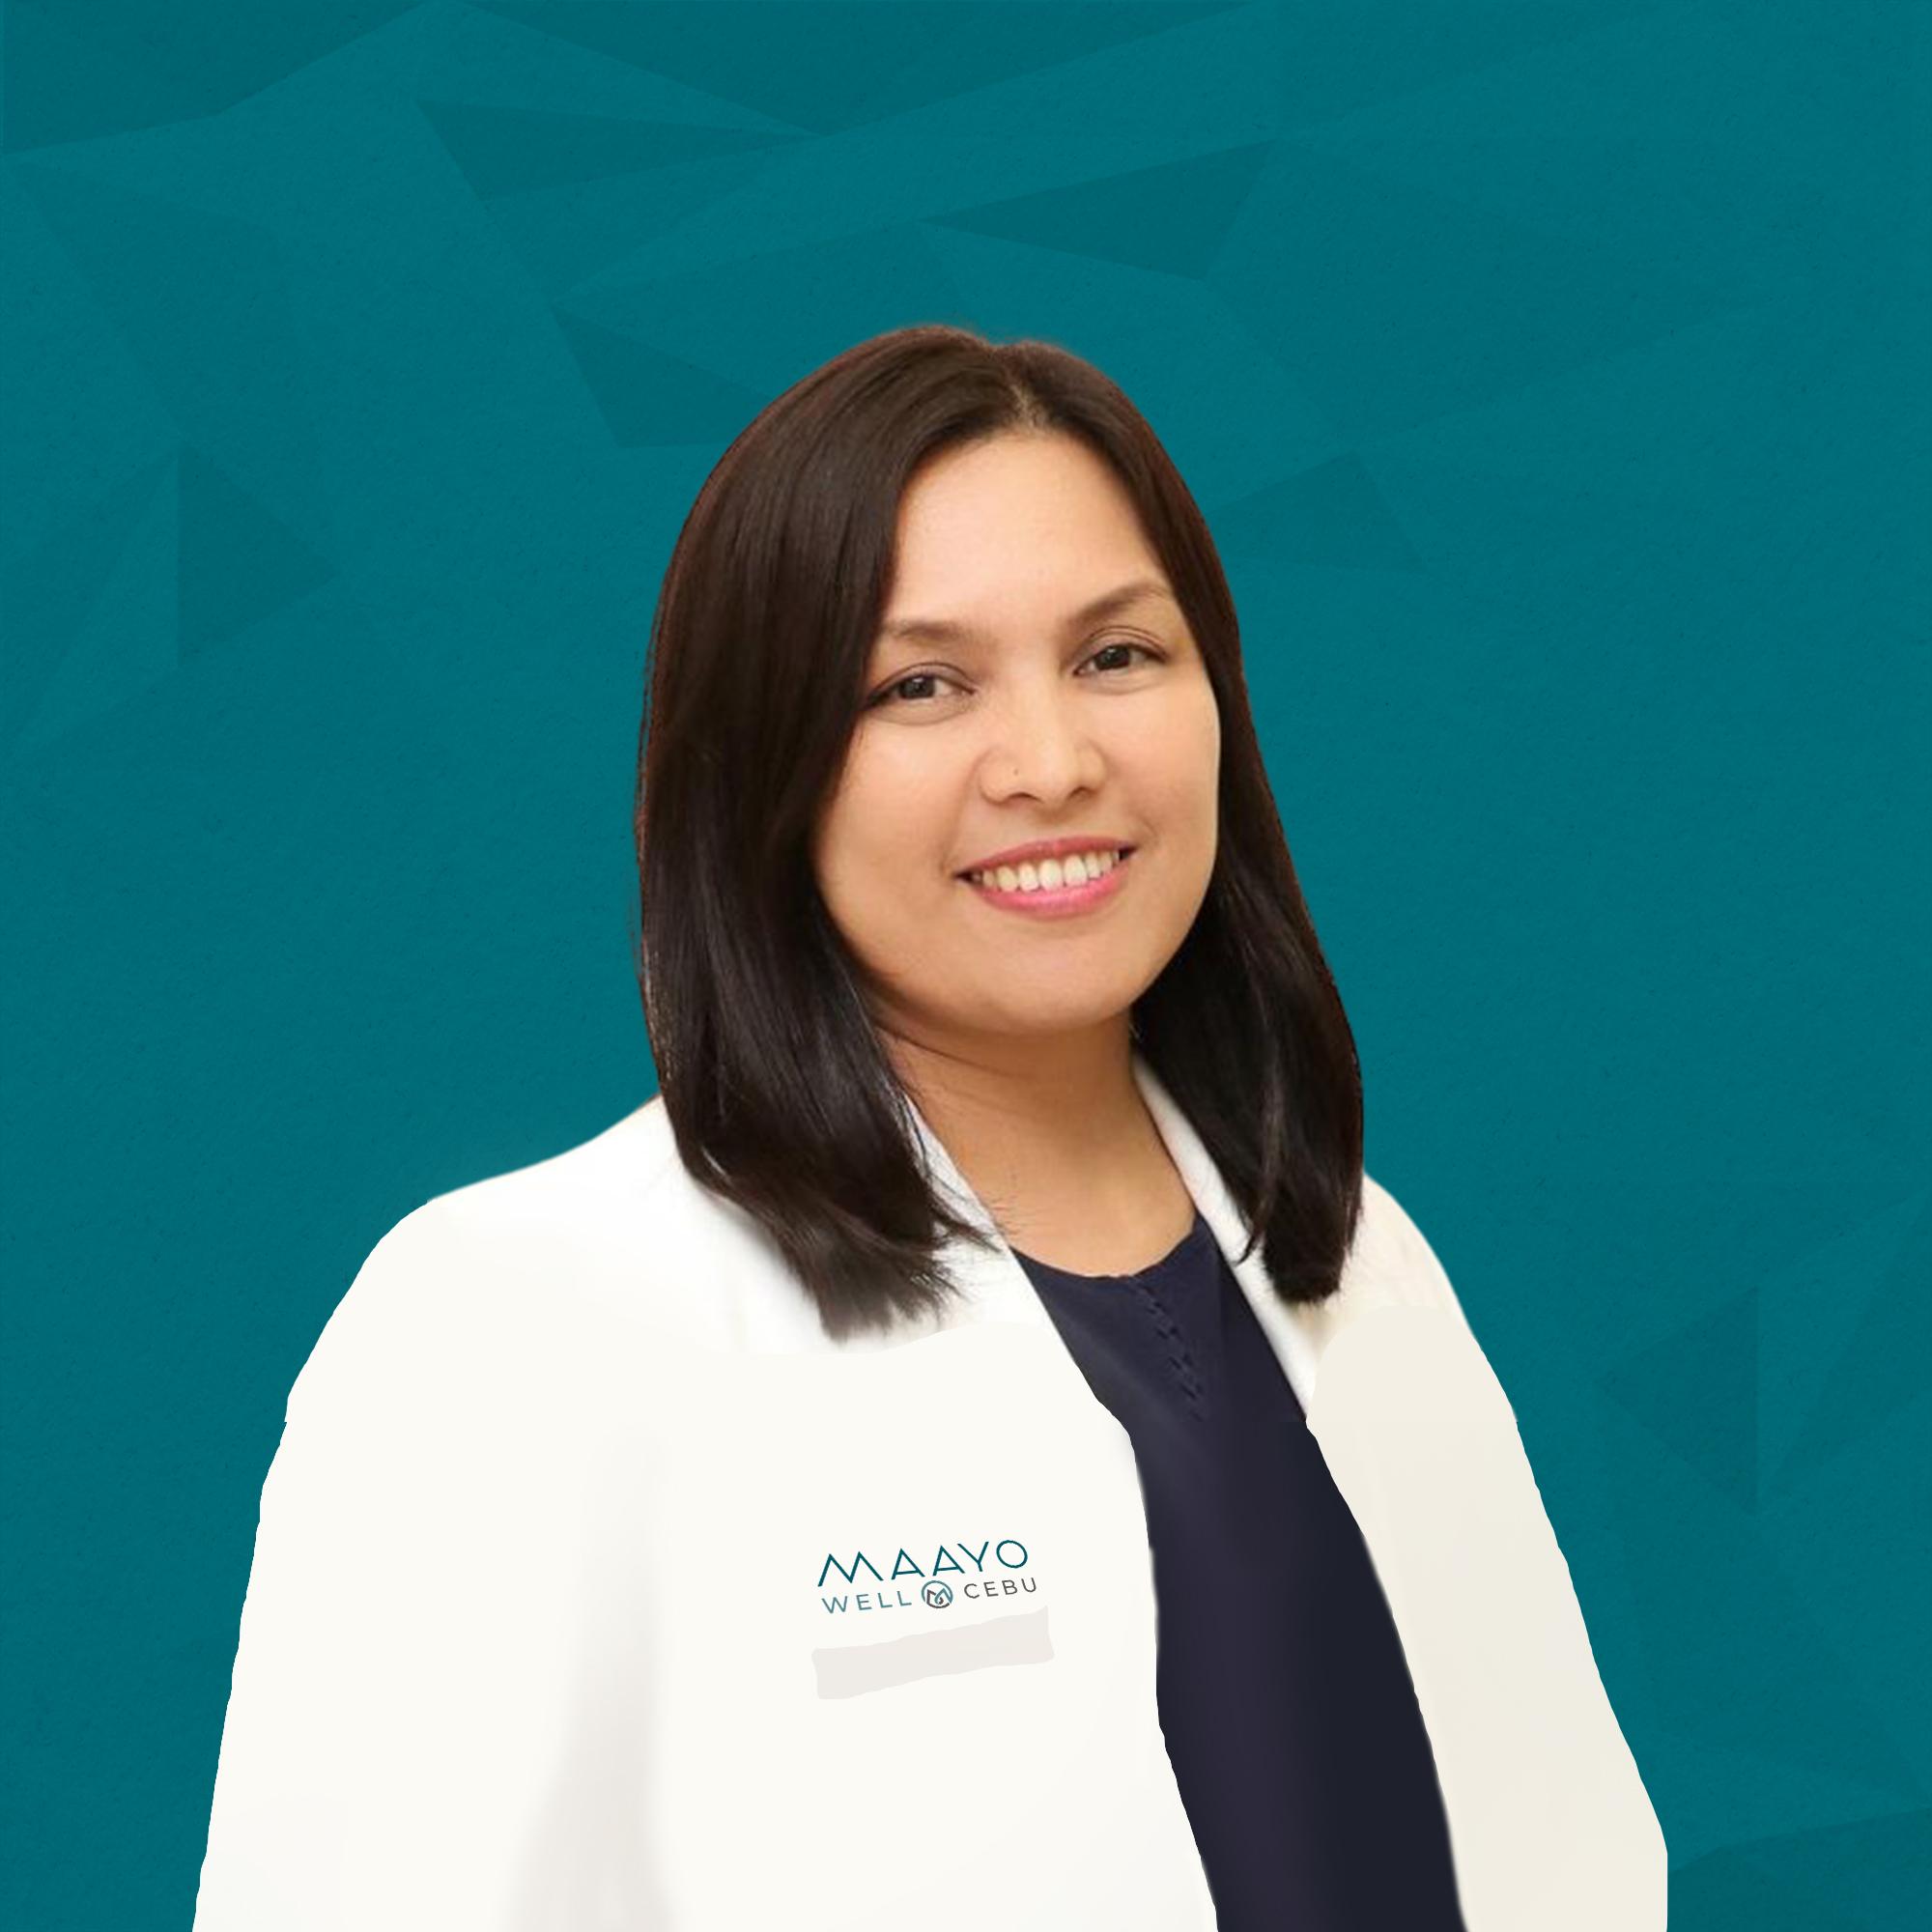 DR. ARONG, MARJORIE CHRIS